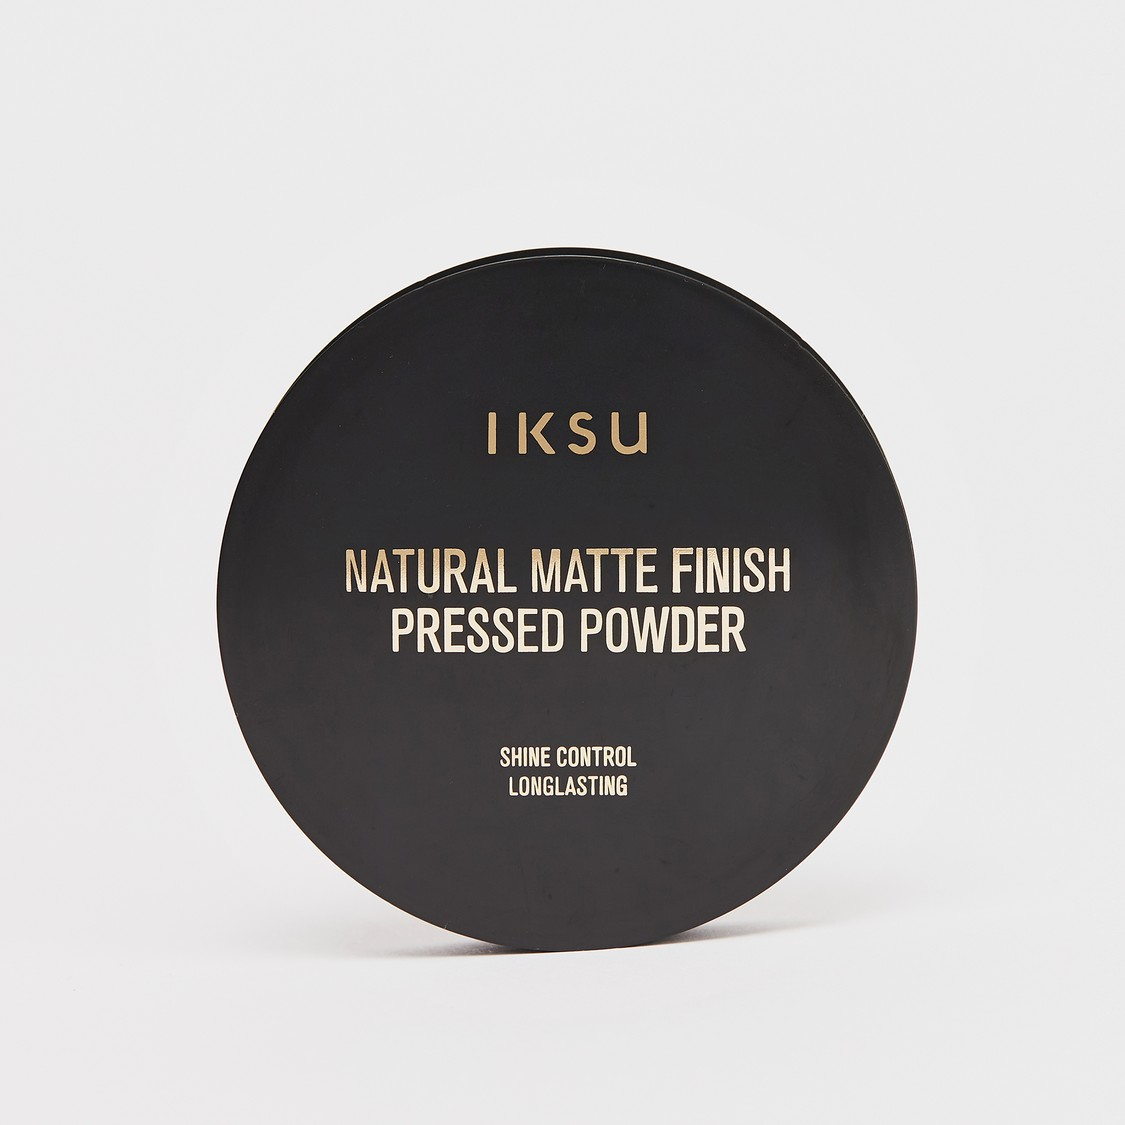 IKSU Natural Matte Finish Pressed Powder